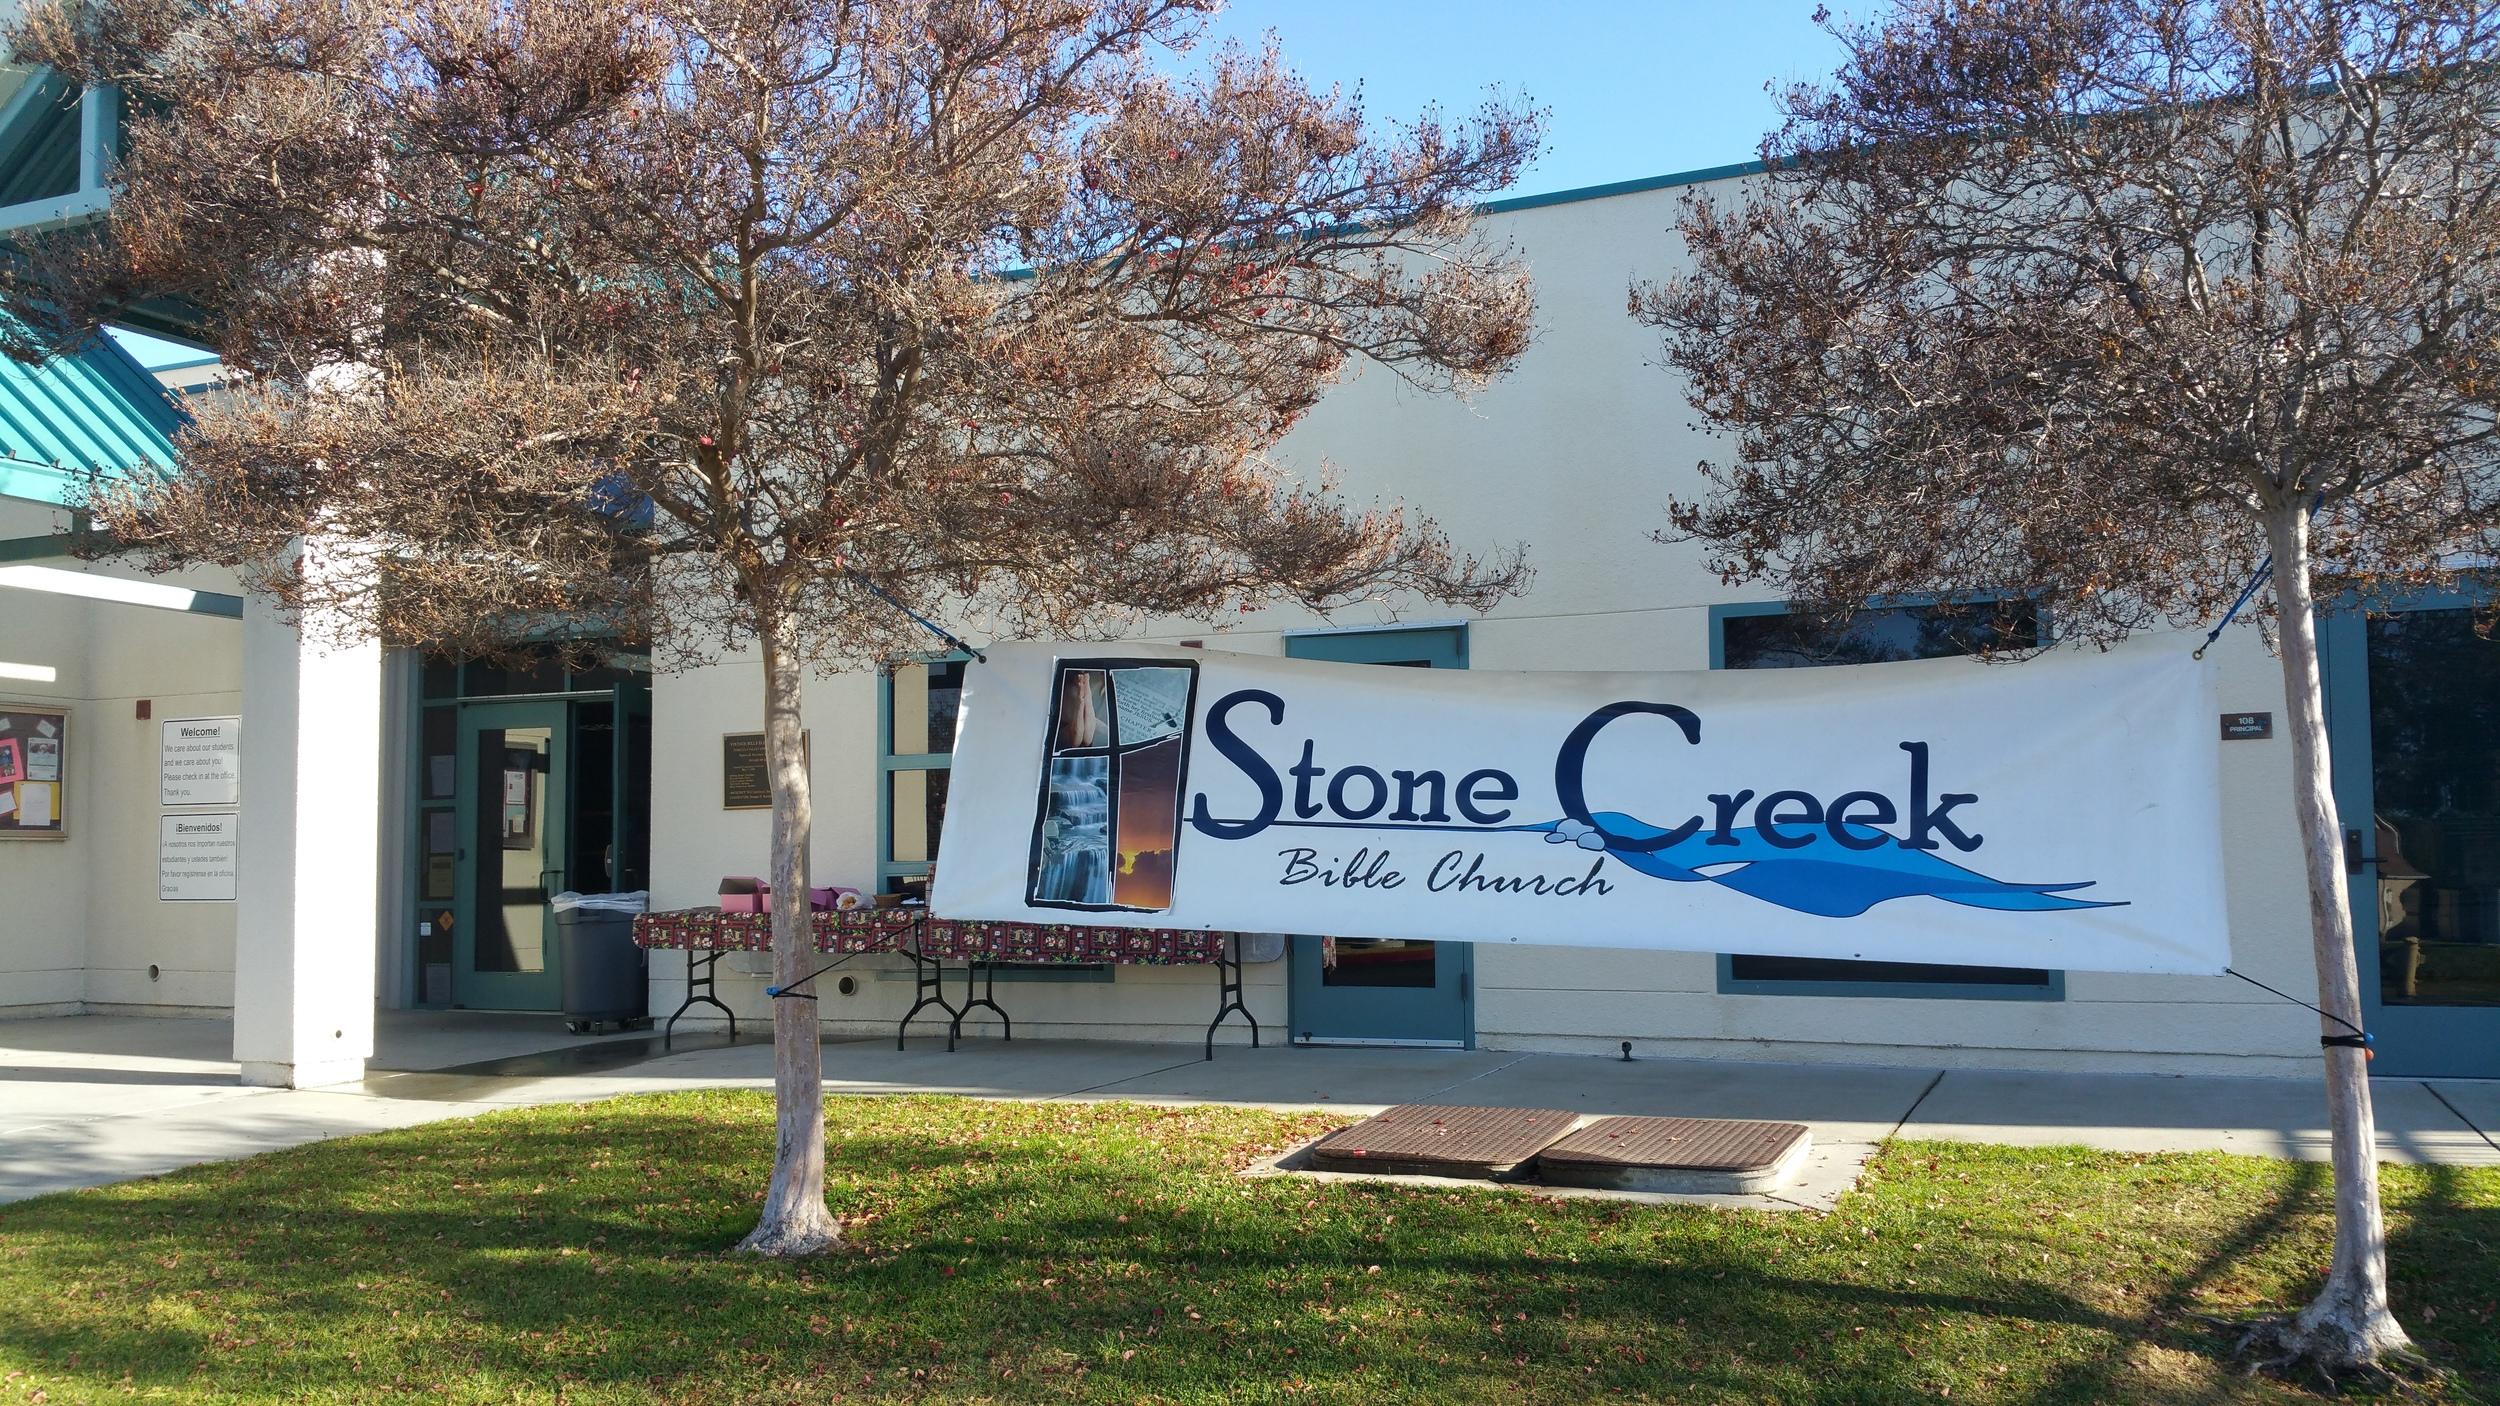 Stone creek bible church, Temecula, CA. Meets at Vintage hills elementary school